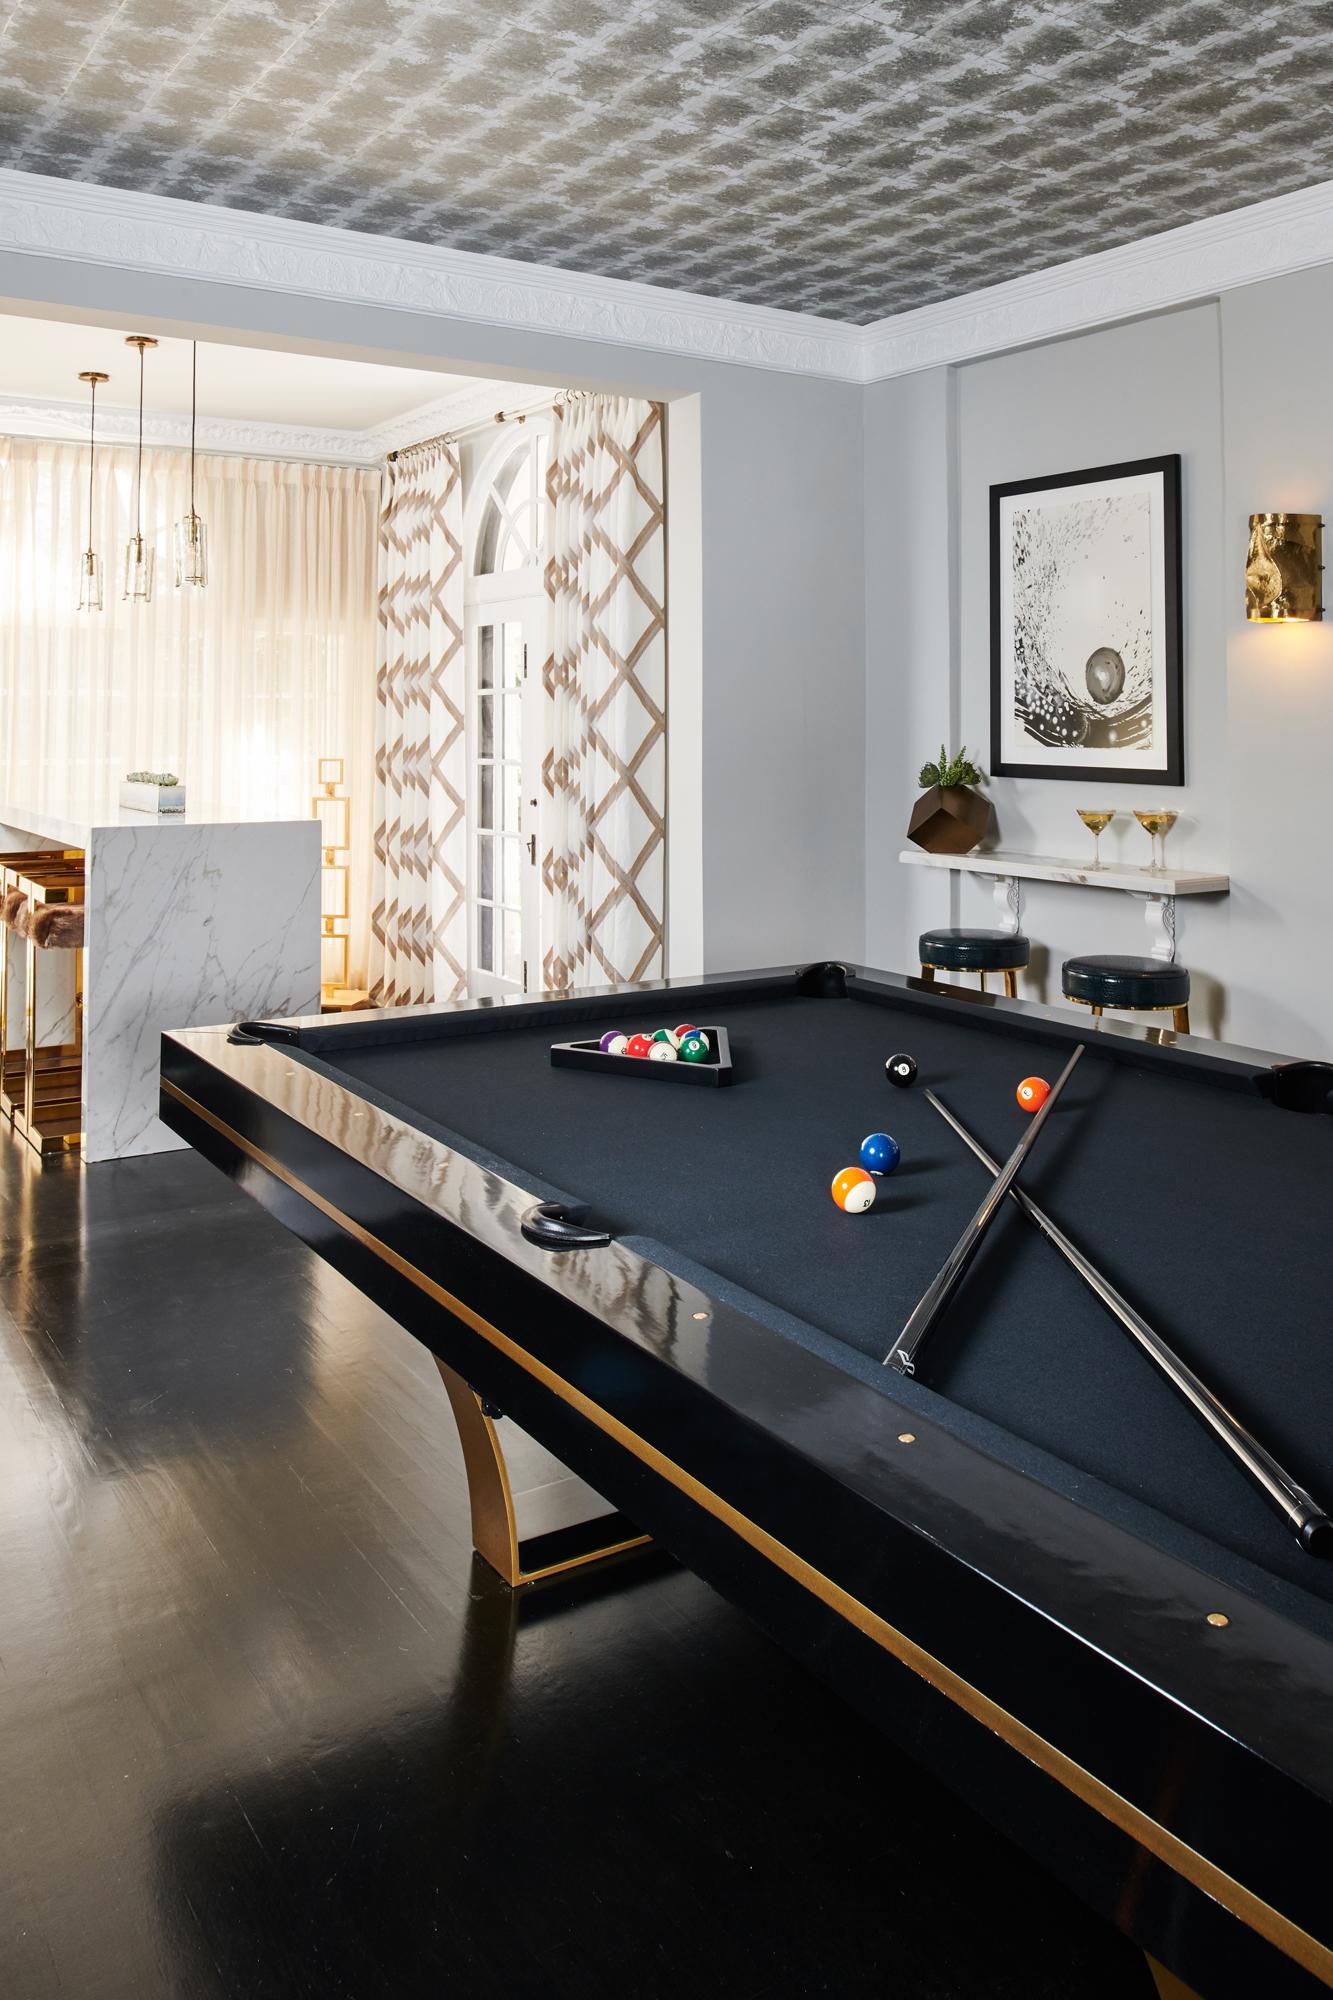 Pasadena Showcase House of Design, Billiard Room and Petite Lounge - Designer: Designs of the Interior, Photographer: Peter Christiansen Valli